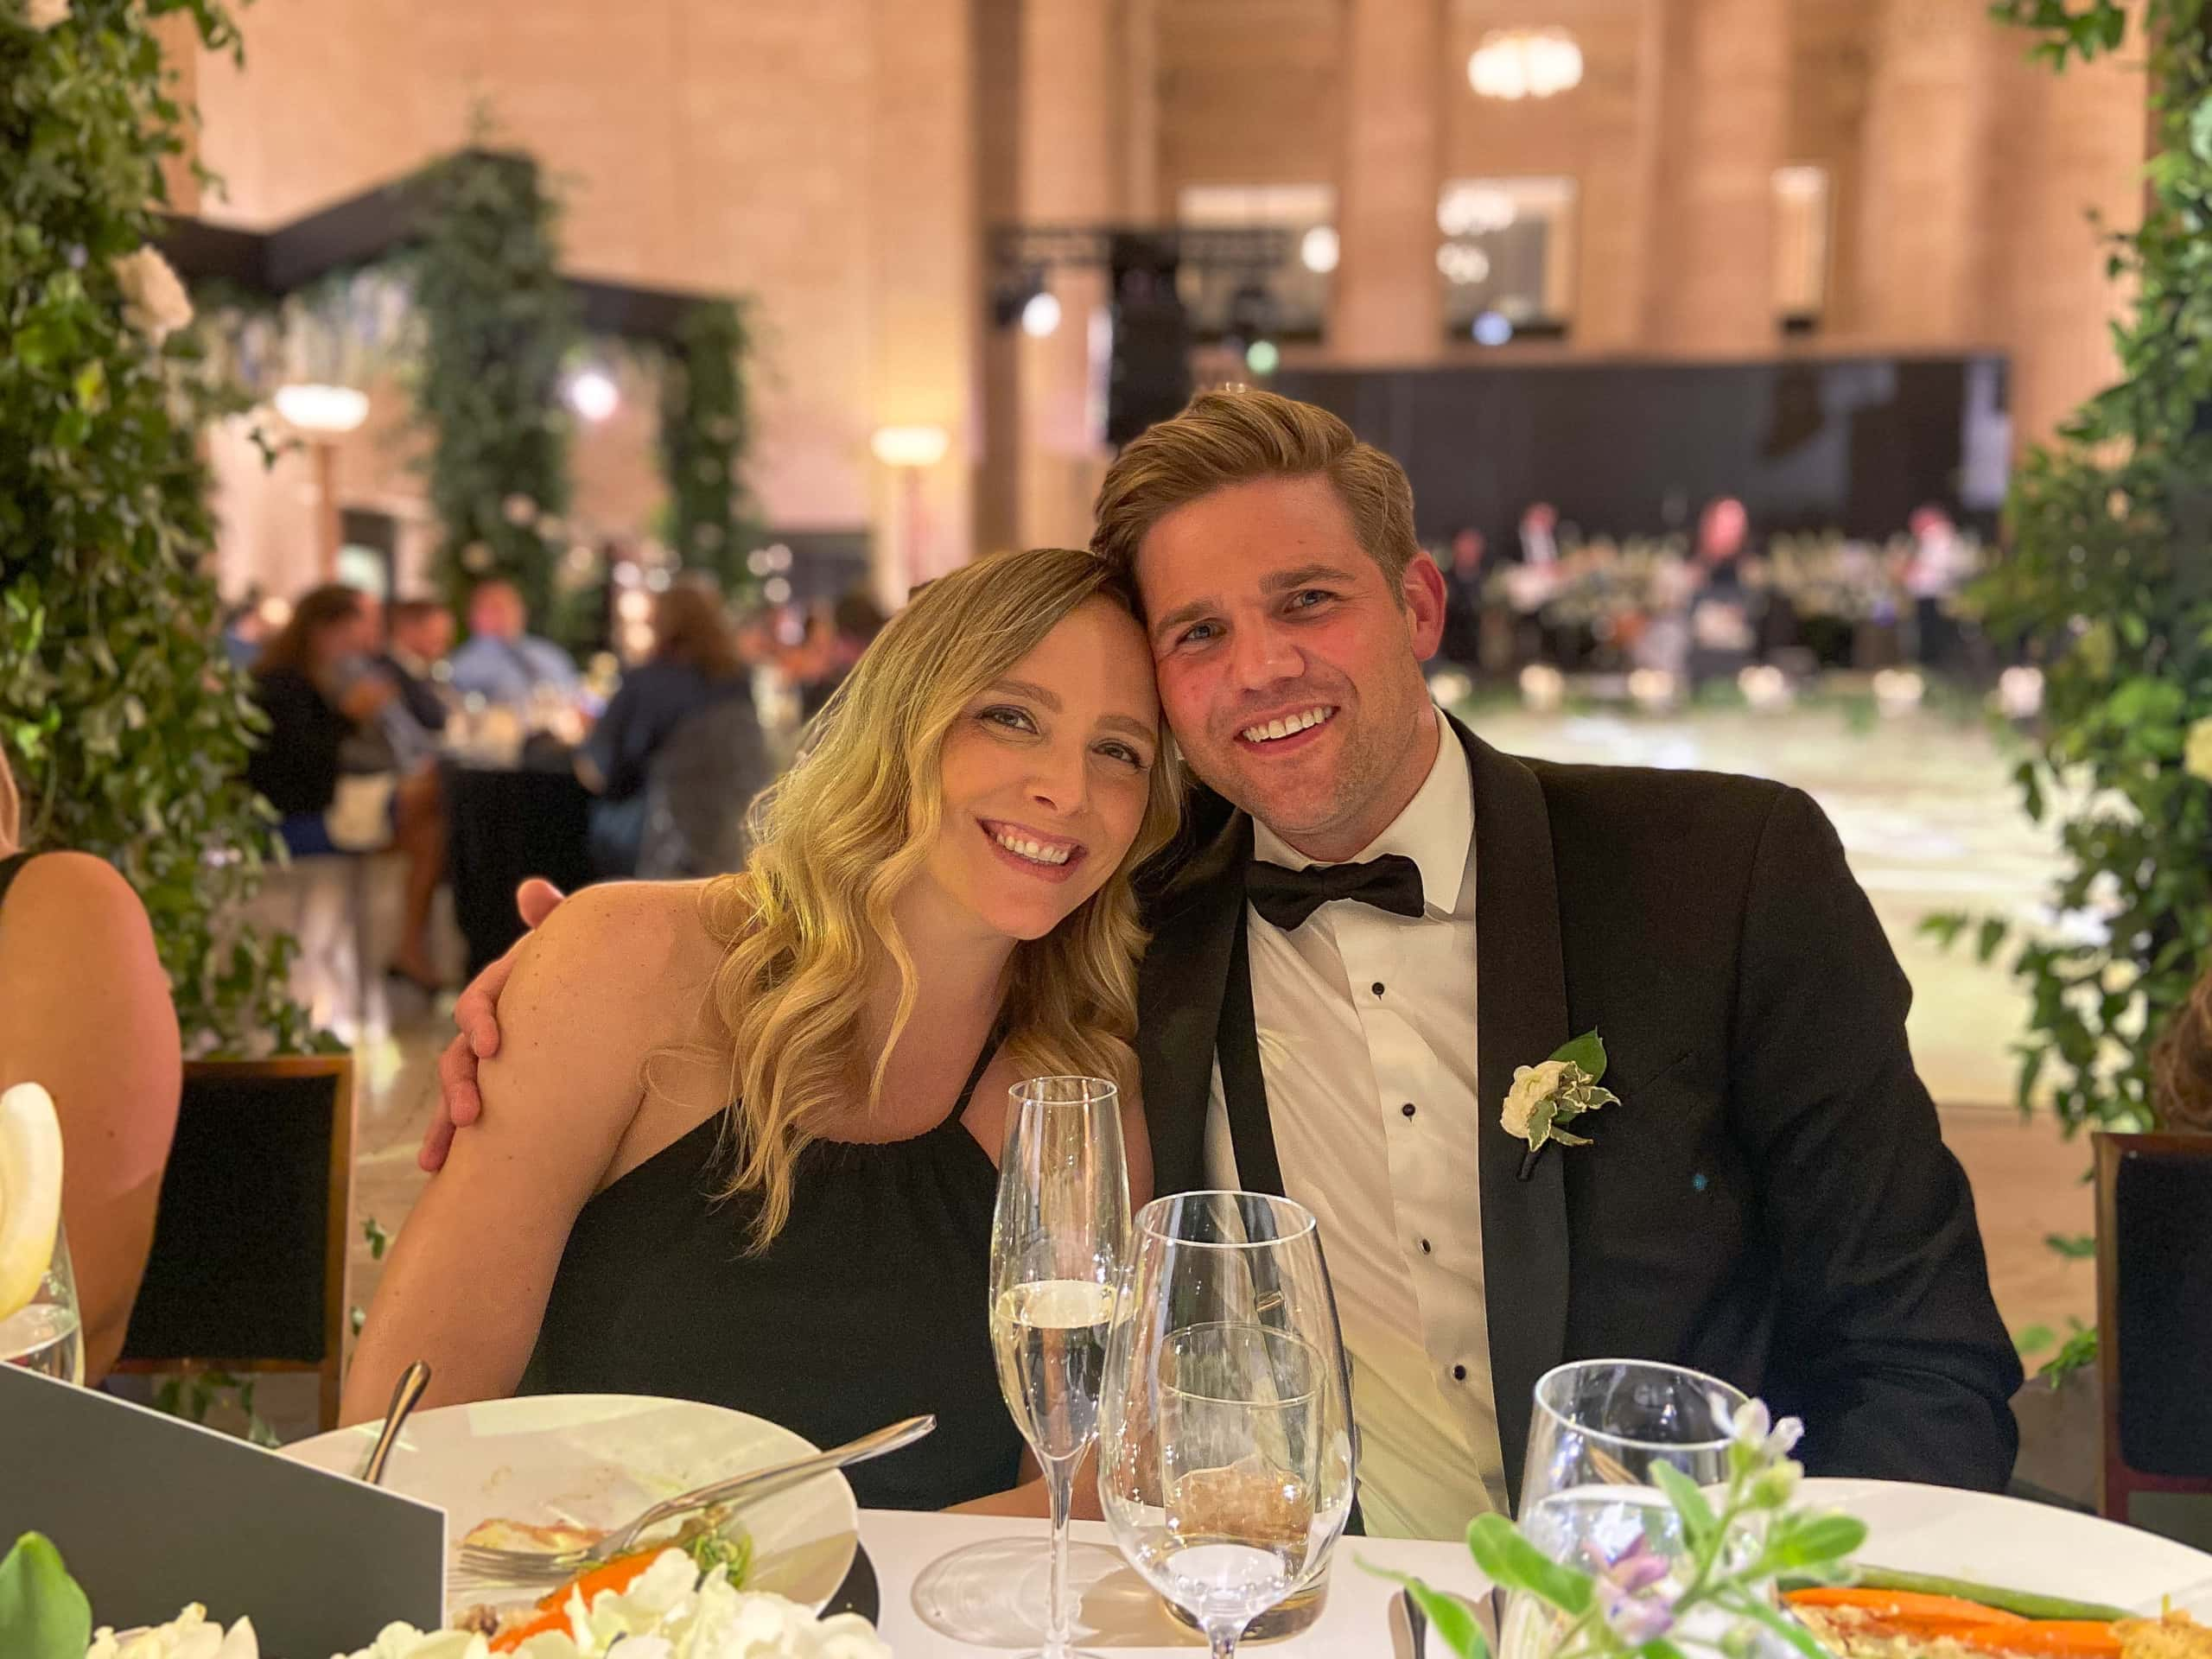 Ryan and Sarah's wedding day